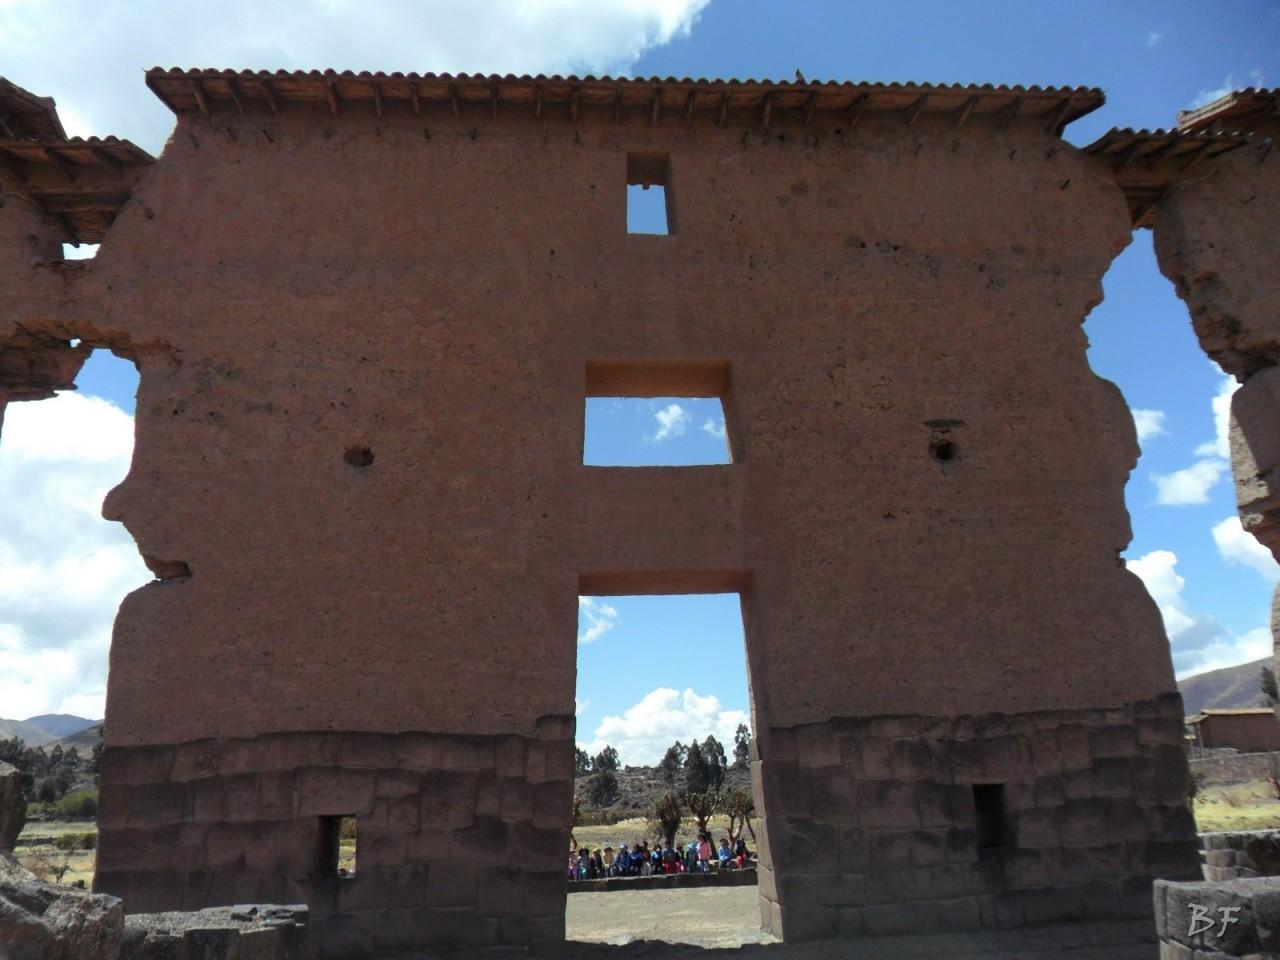 Tempio-di-Viracocha-Megaliti-San-Pedro-Cusco-Perù-4